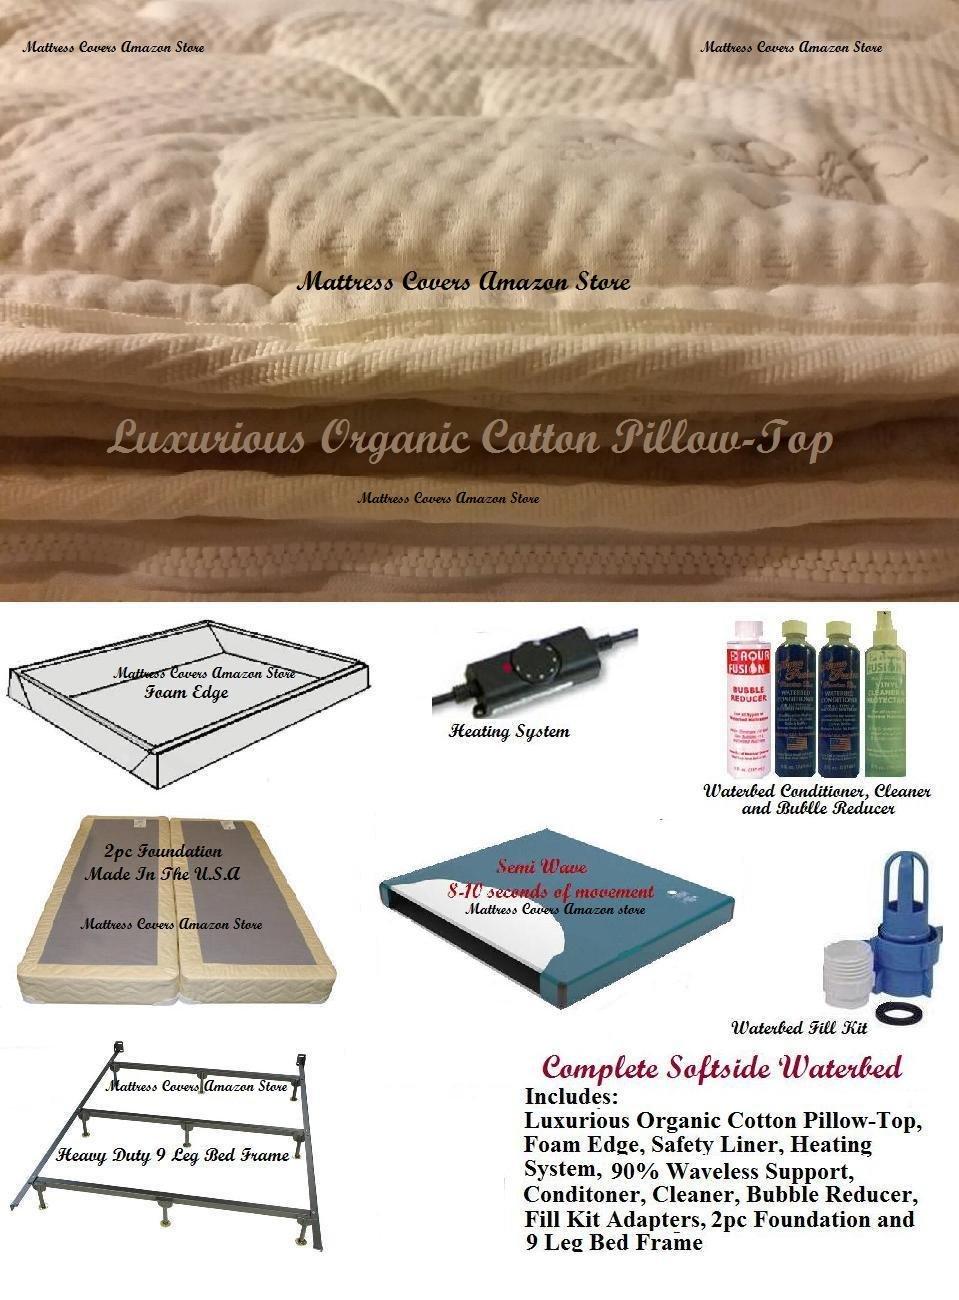 Queen Softside Waterbed With Organic Pillowtop & semi Wave mattress by U.S. Water, Glideaway, Aqua Fusion, Calesco